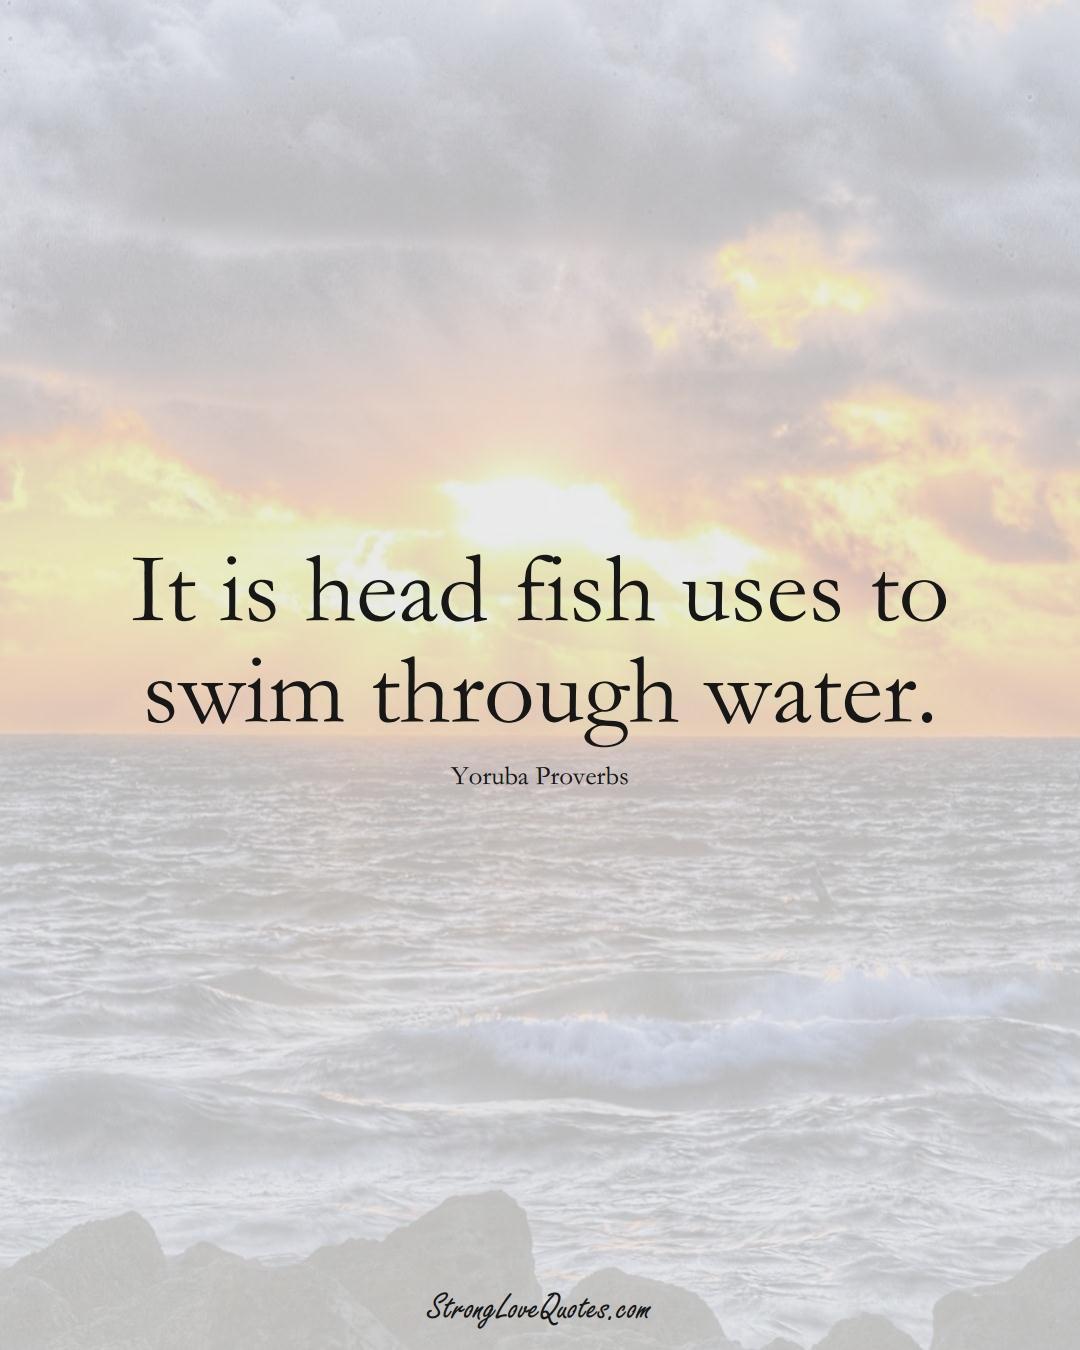 It is head fish uses to swim through water. (Yoruba Sayings);  #aVarietyofCulturesSayings